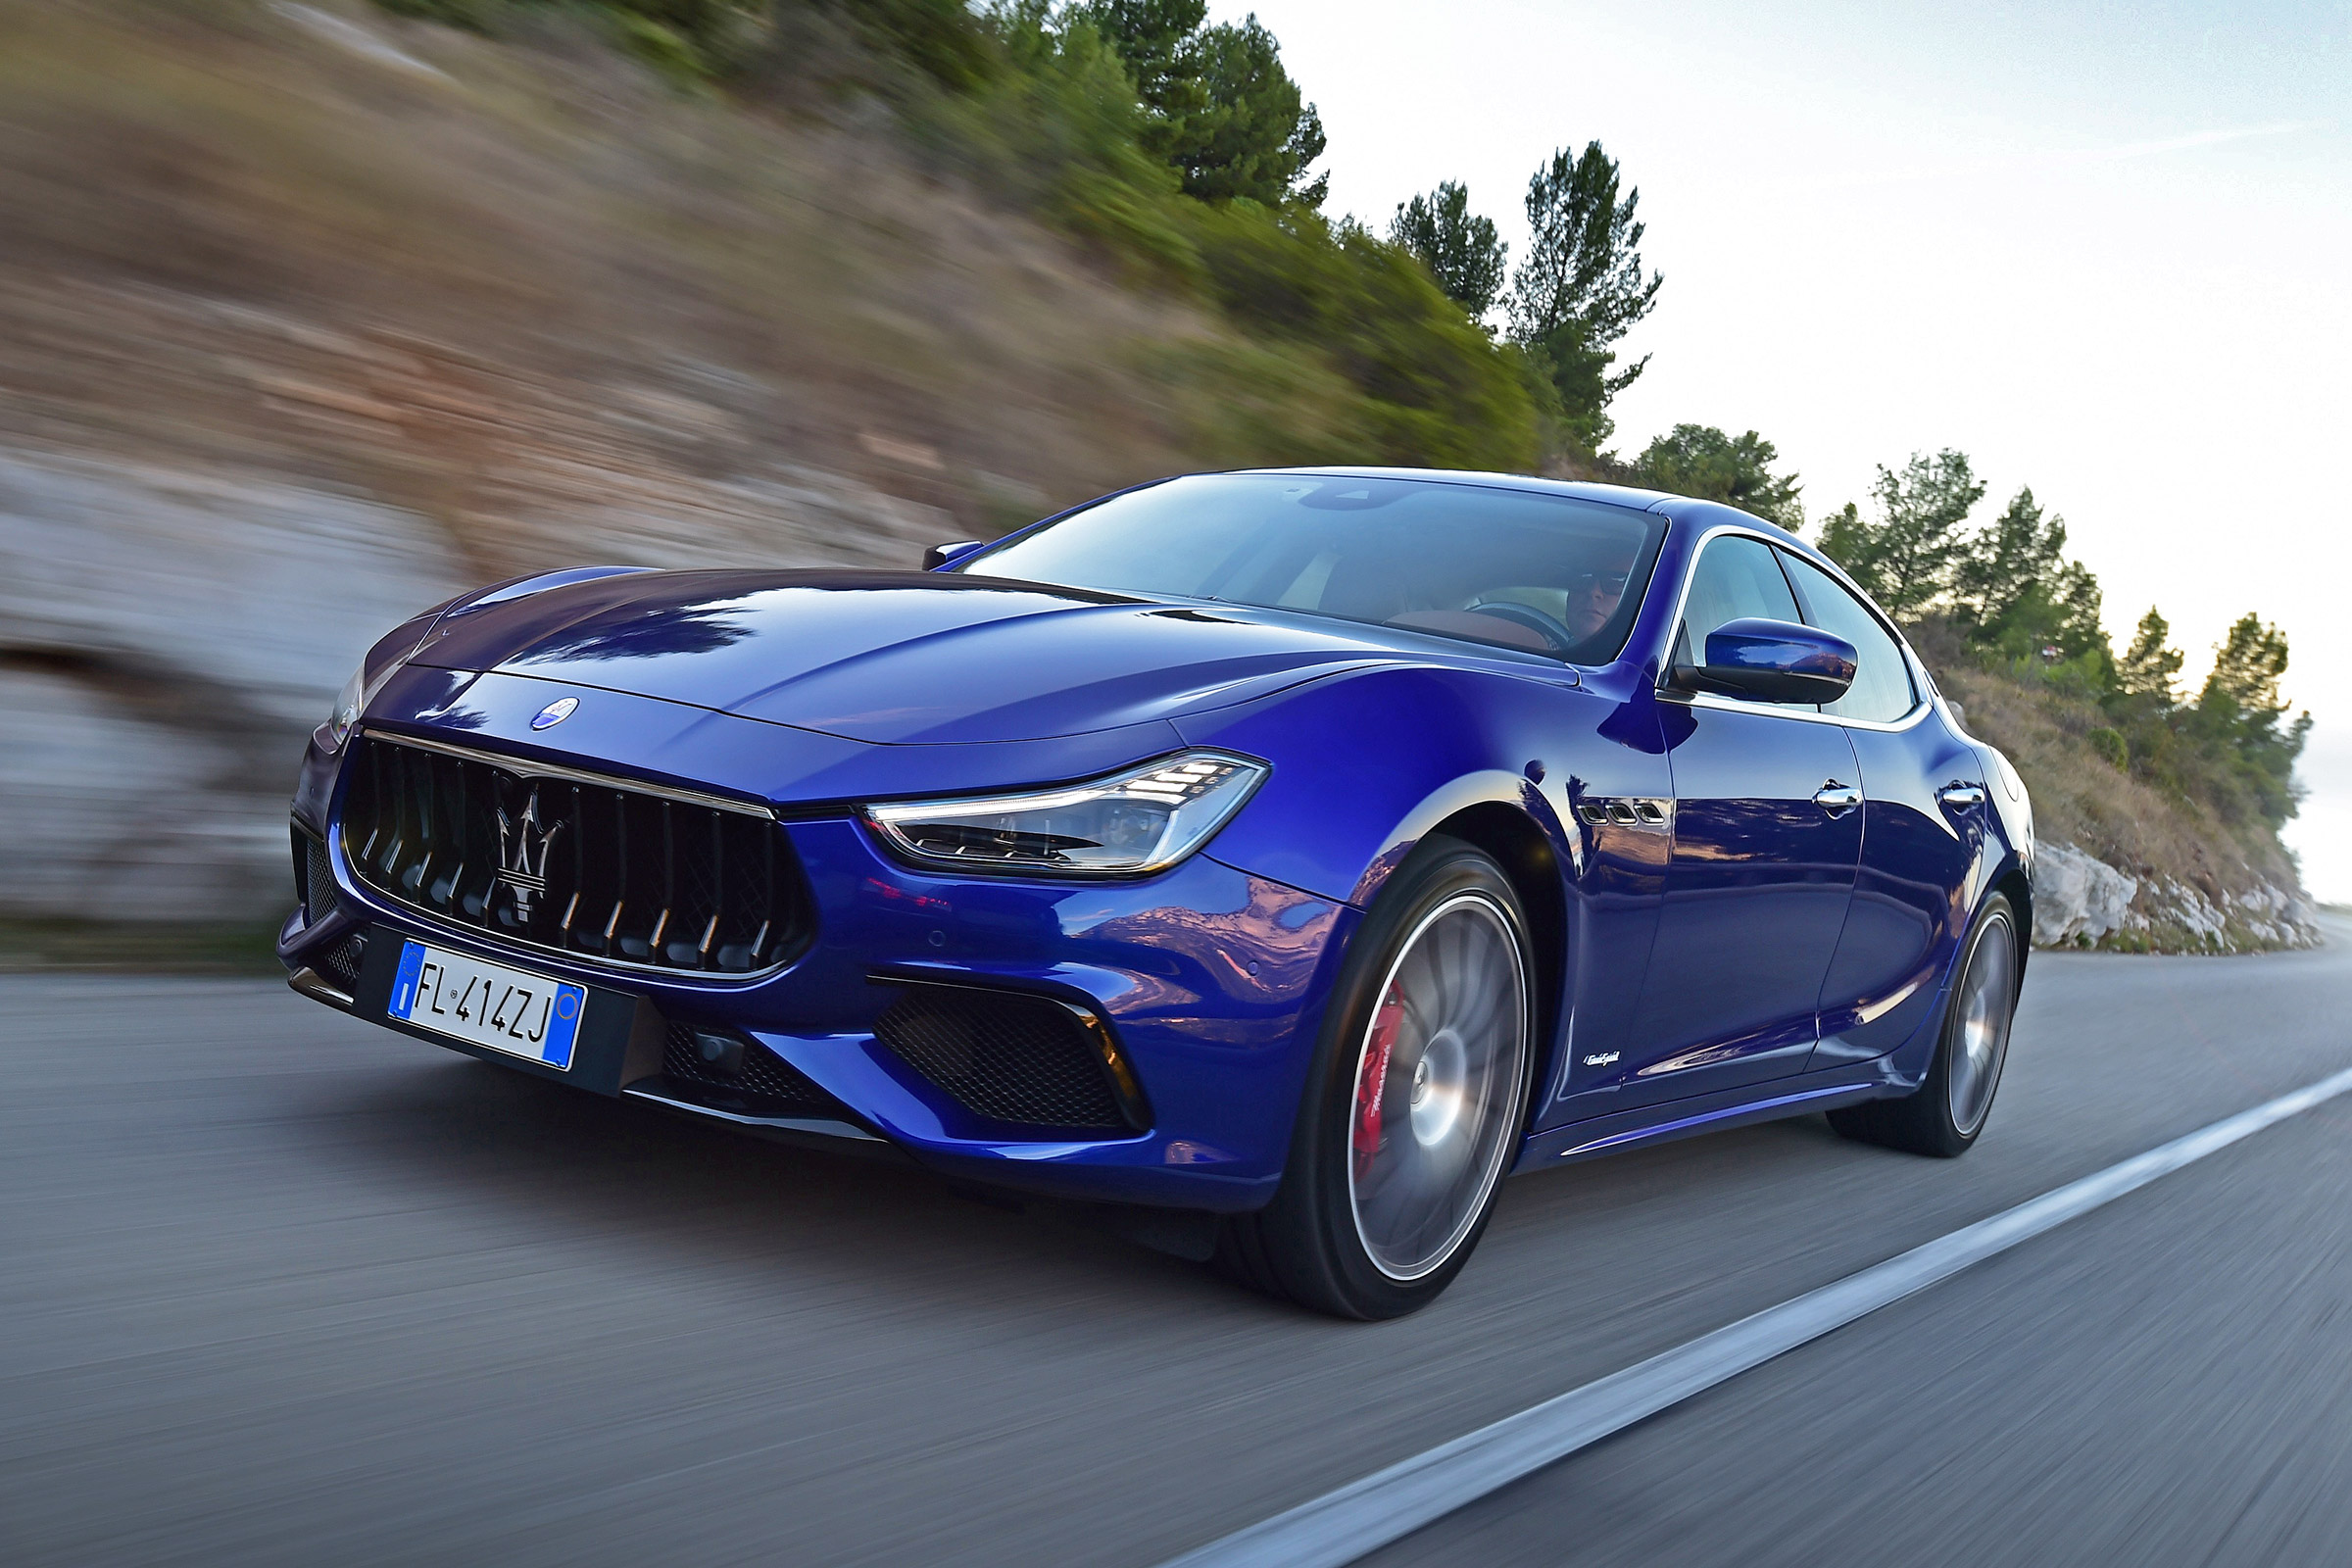 Maserati Ghibli S 2017 facelift review | Auto Express